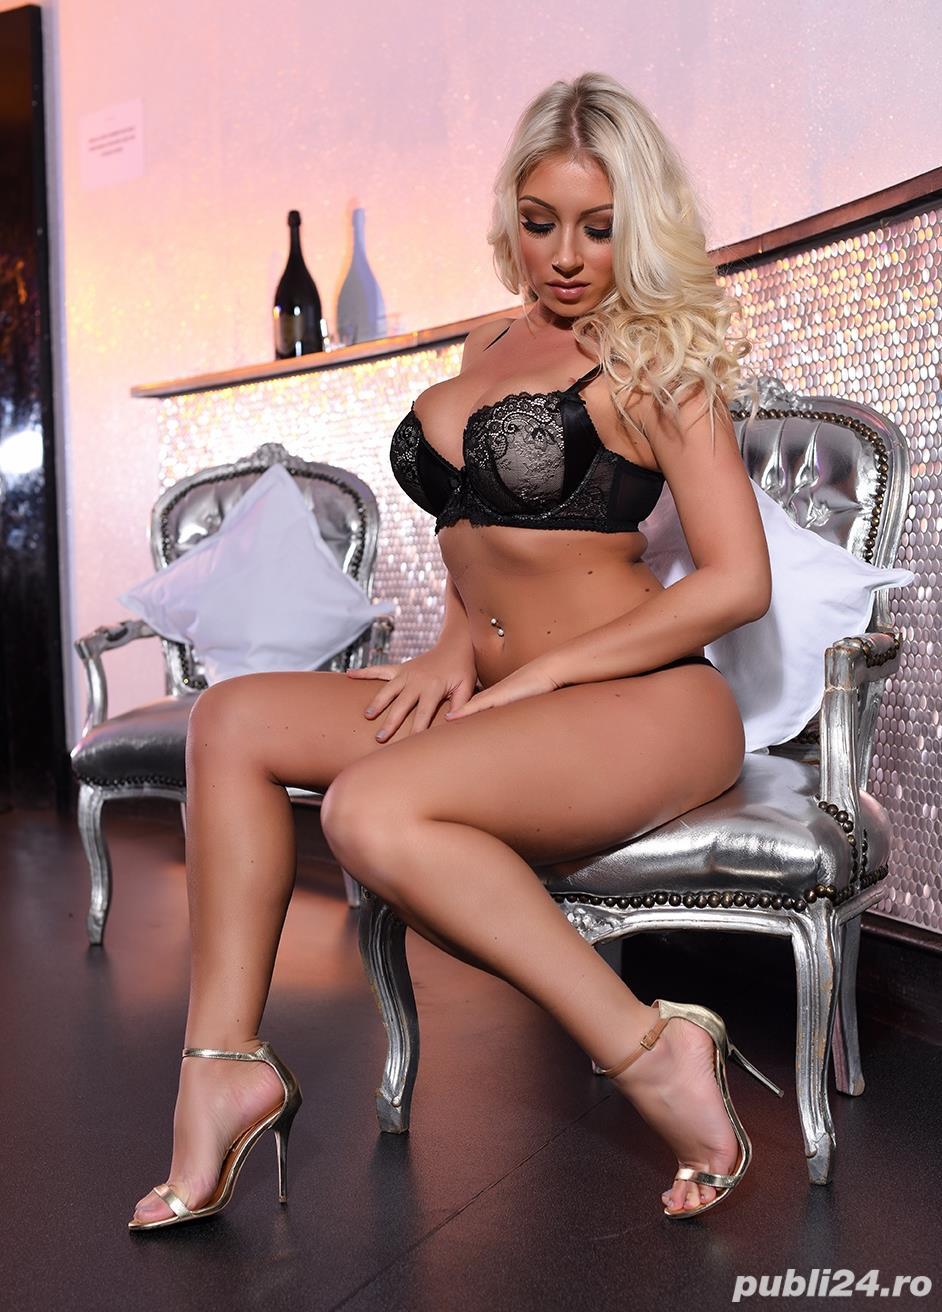 beautifull blonde girl with big natural breast